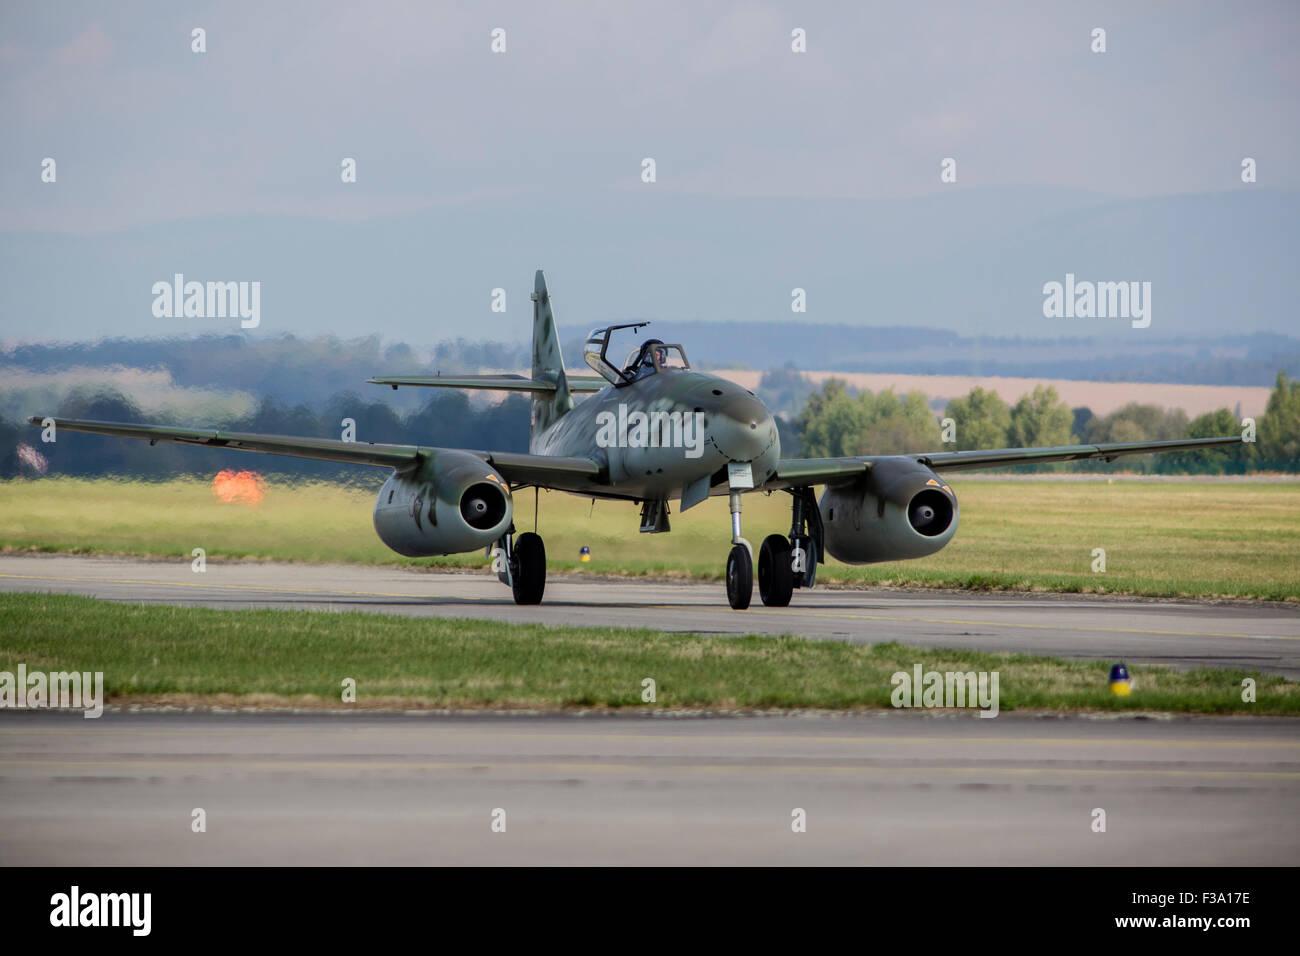 Messerschmitt Me-262 replica taxiing on the runway in Hradec Kralove, Czech Republic. - Stock Image